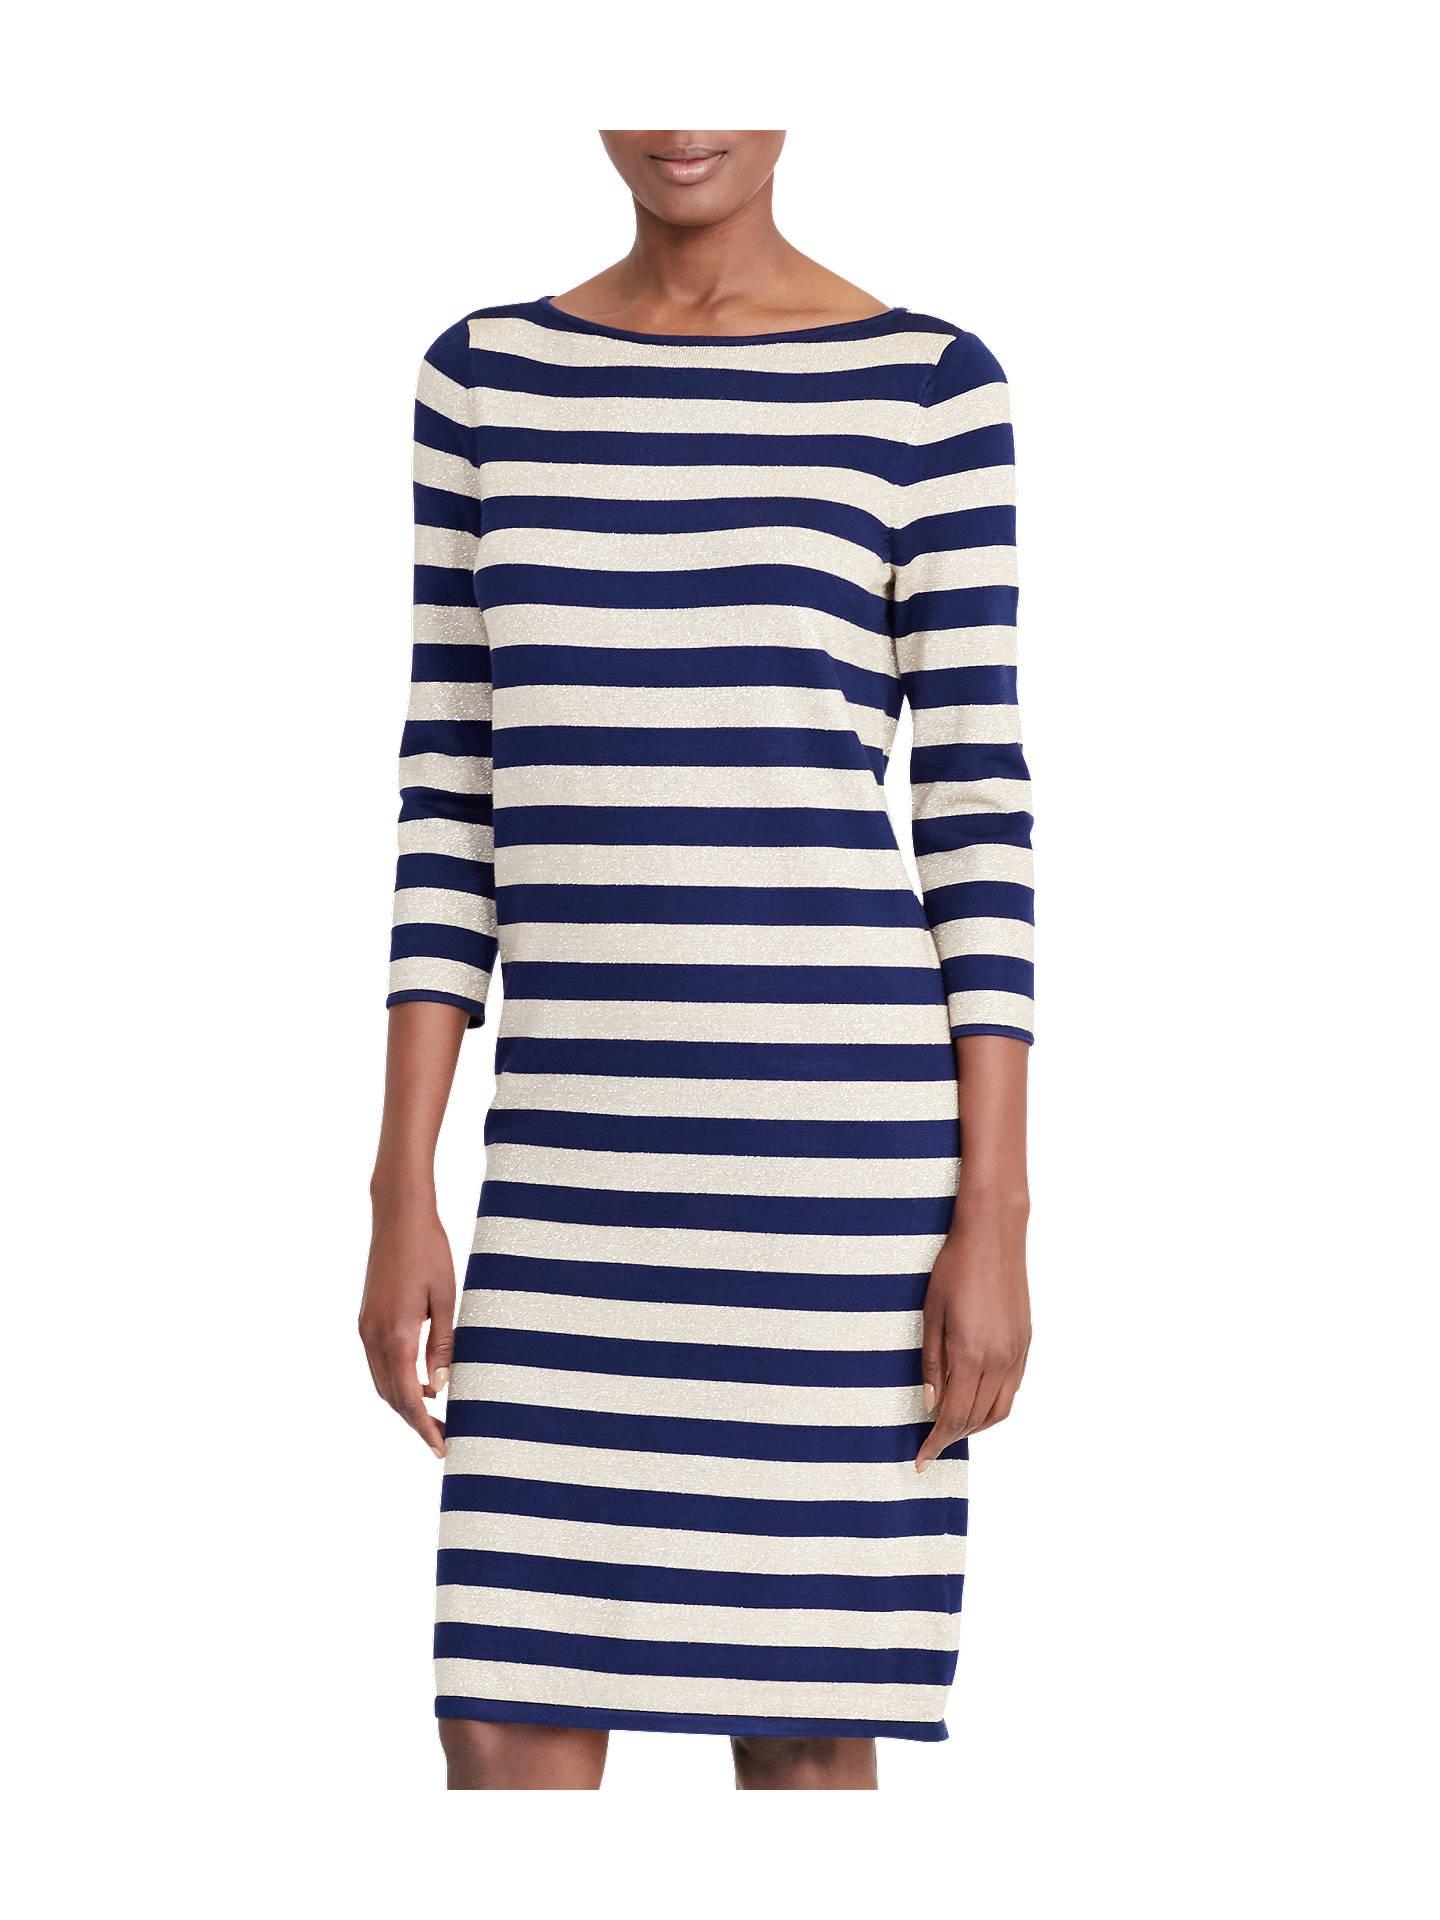 8648d9857fd93 BuyLauren Ralph Lauren Stripe Metallic Dress